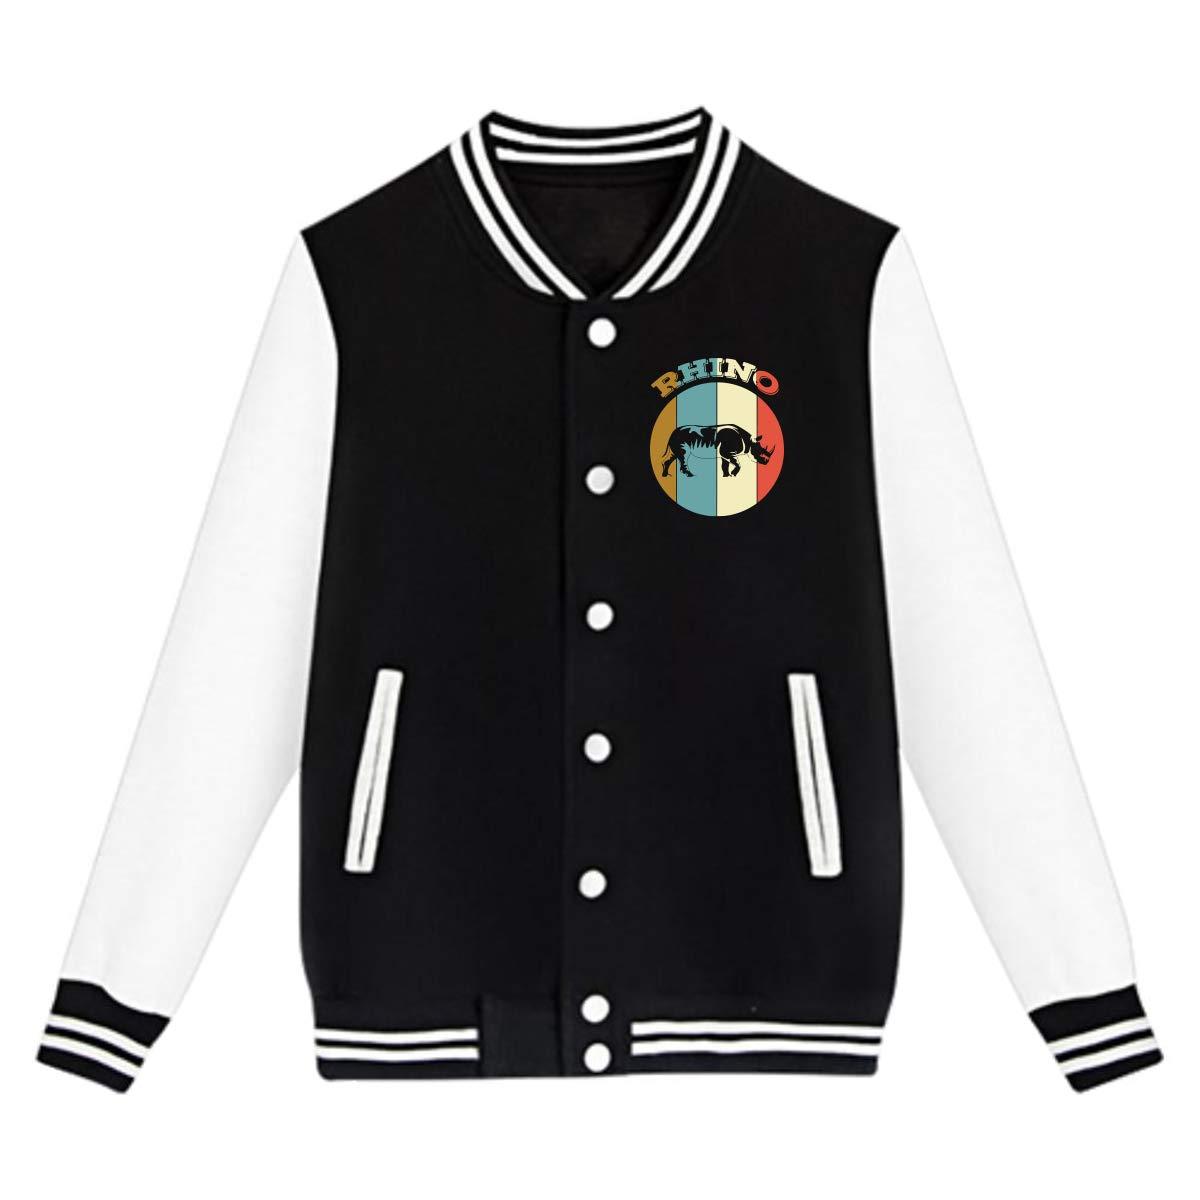 Rhino Retro Coat Sweatshirt Outwear NJKM5MJ Unisex Teen Baseball Uniform Jacket